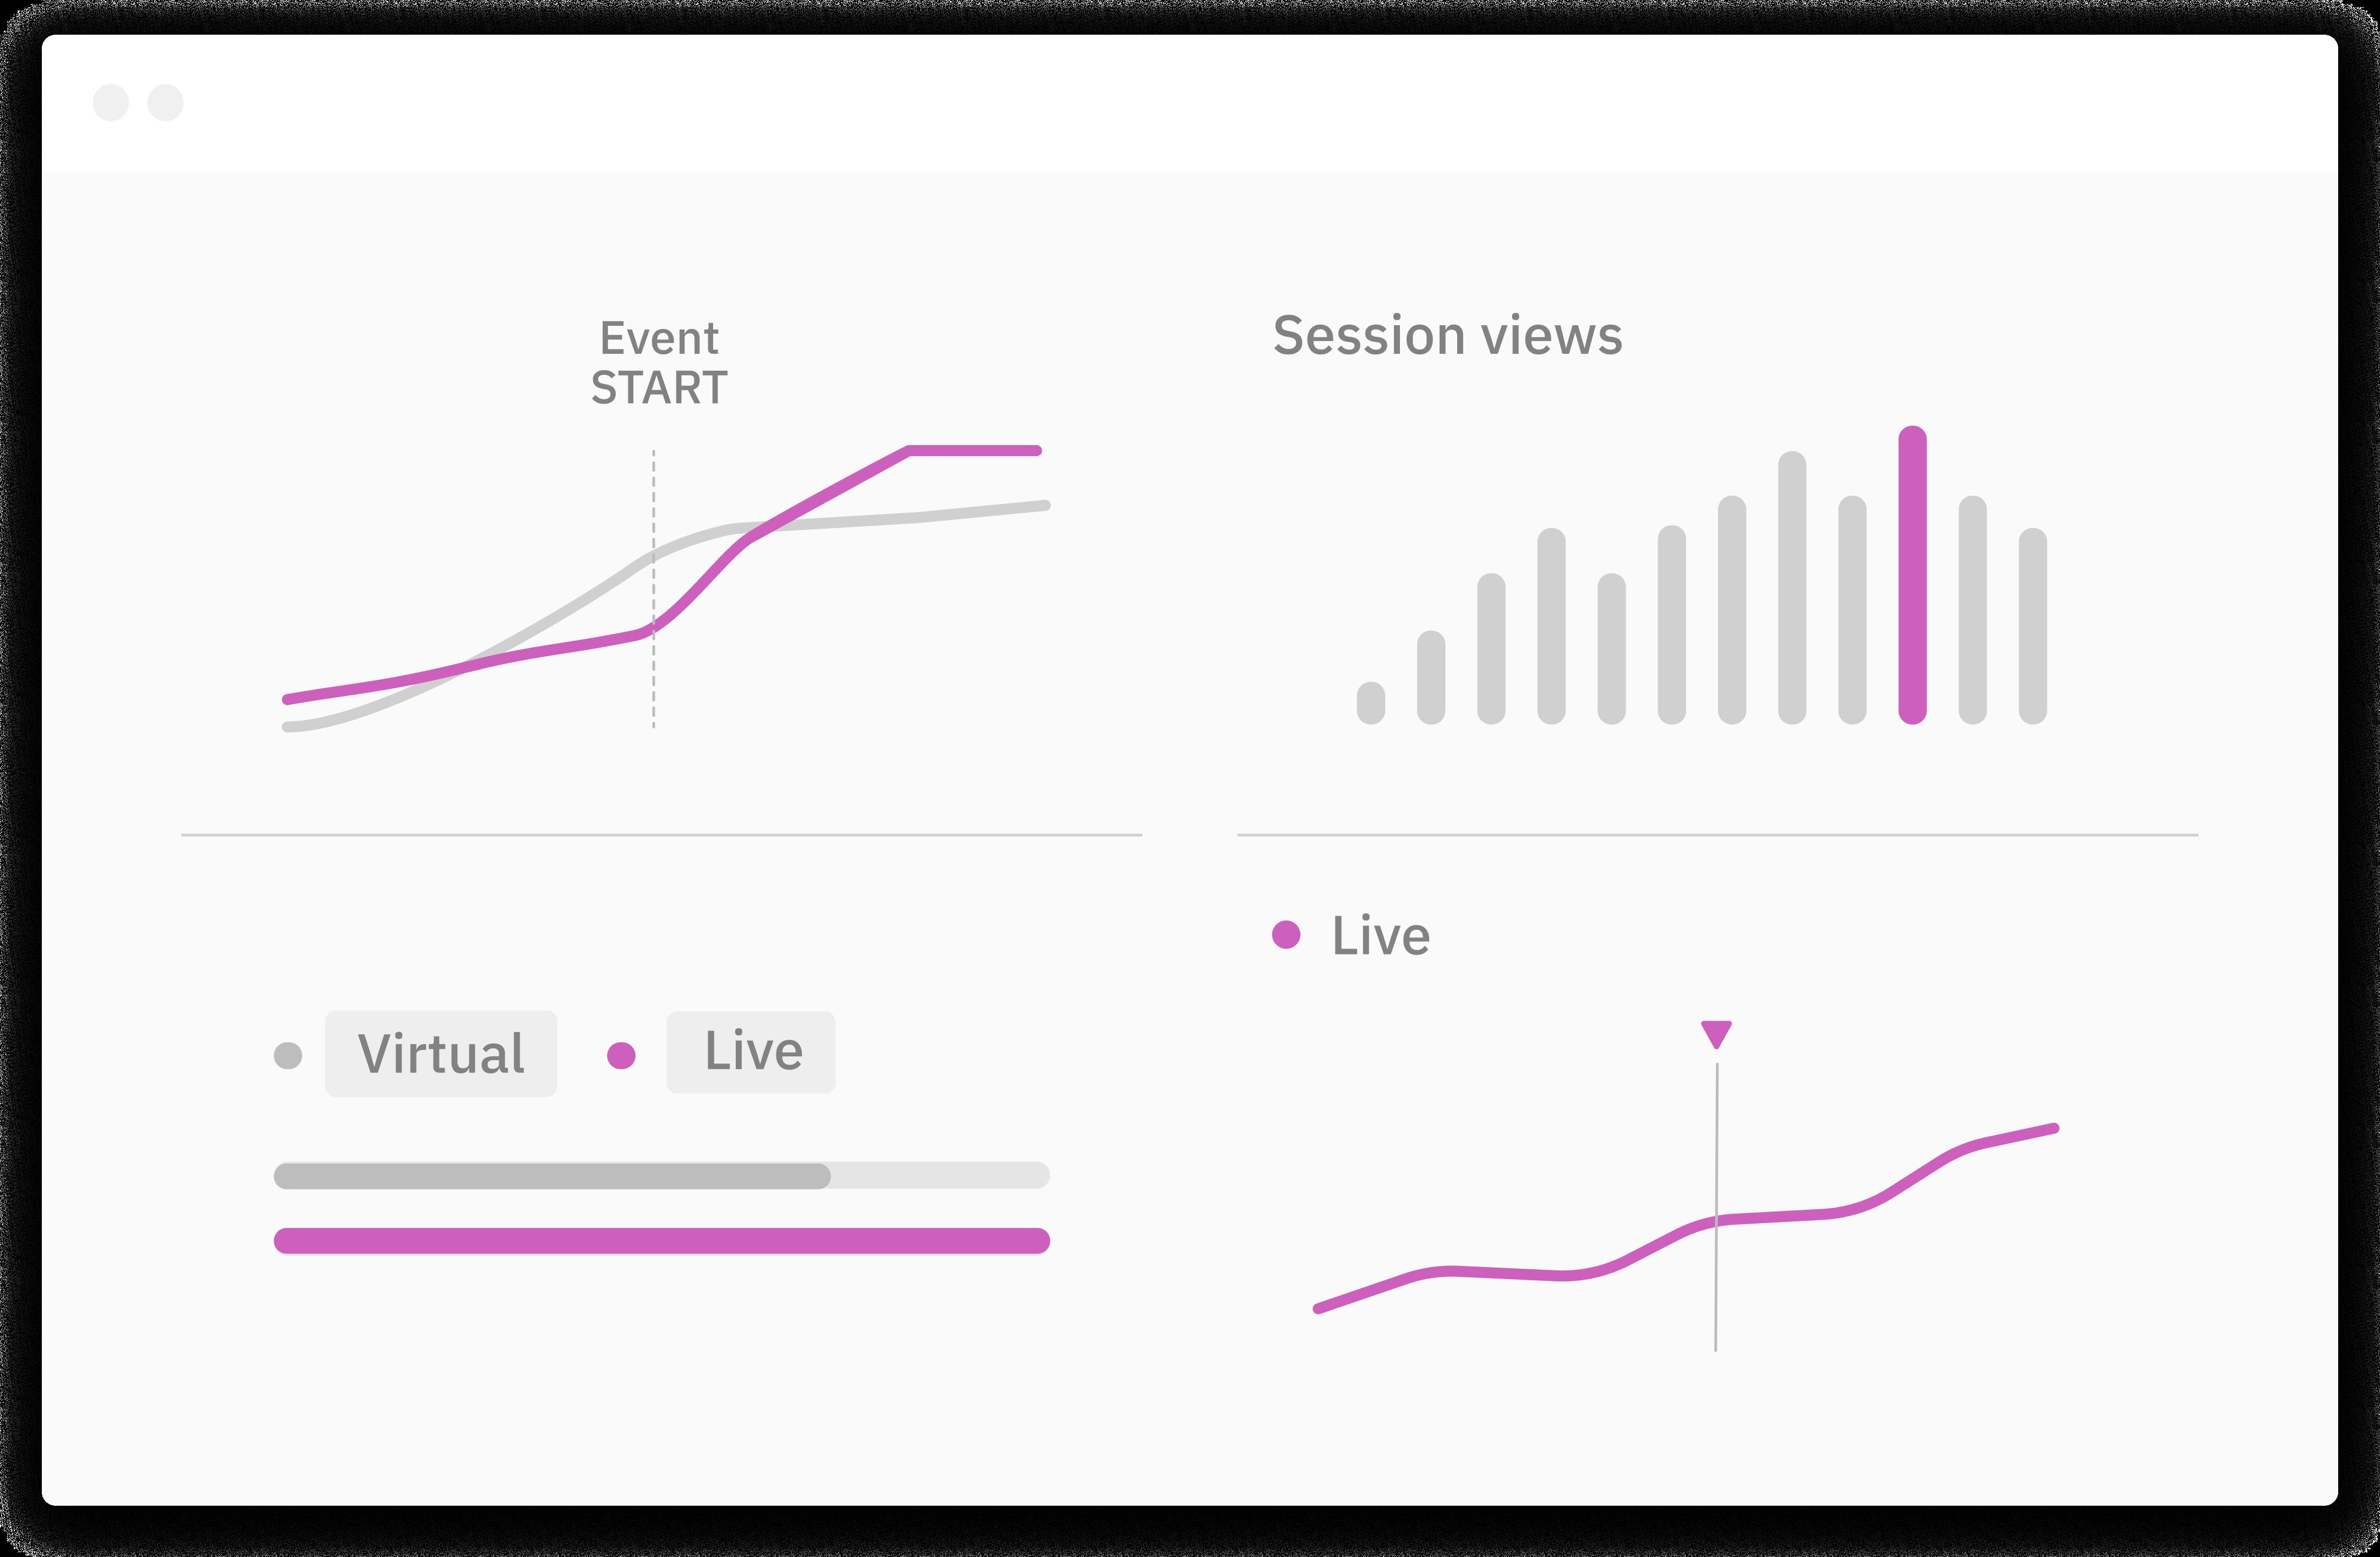 Livestream analytics